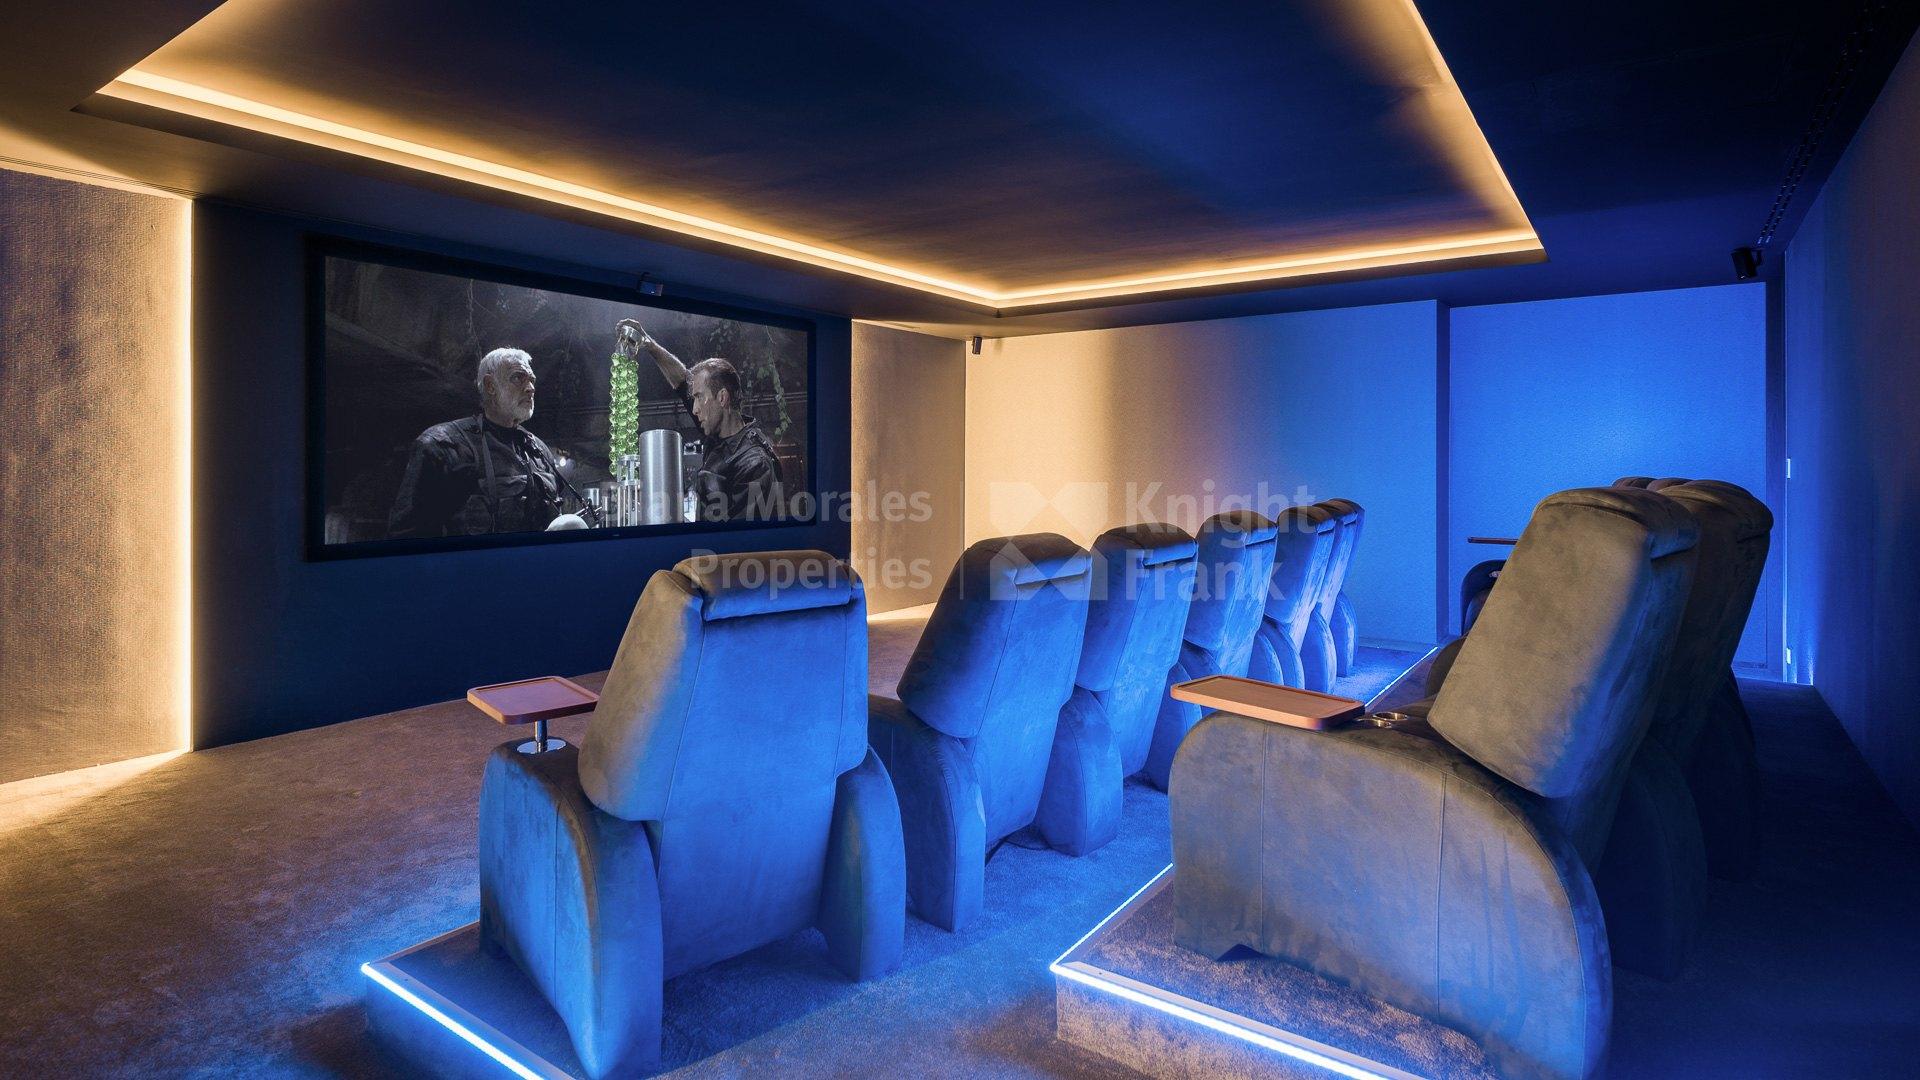 Home Cinema System For Sale Marbella